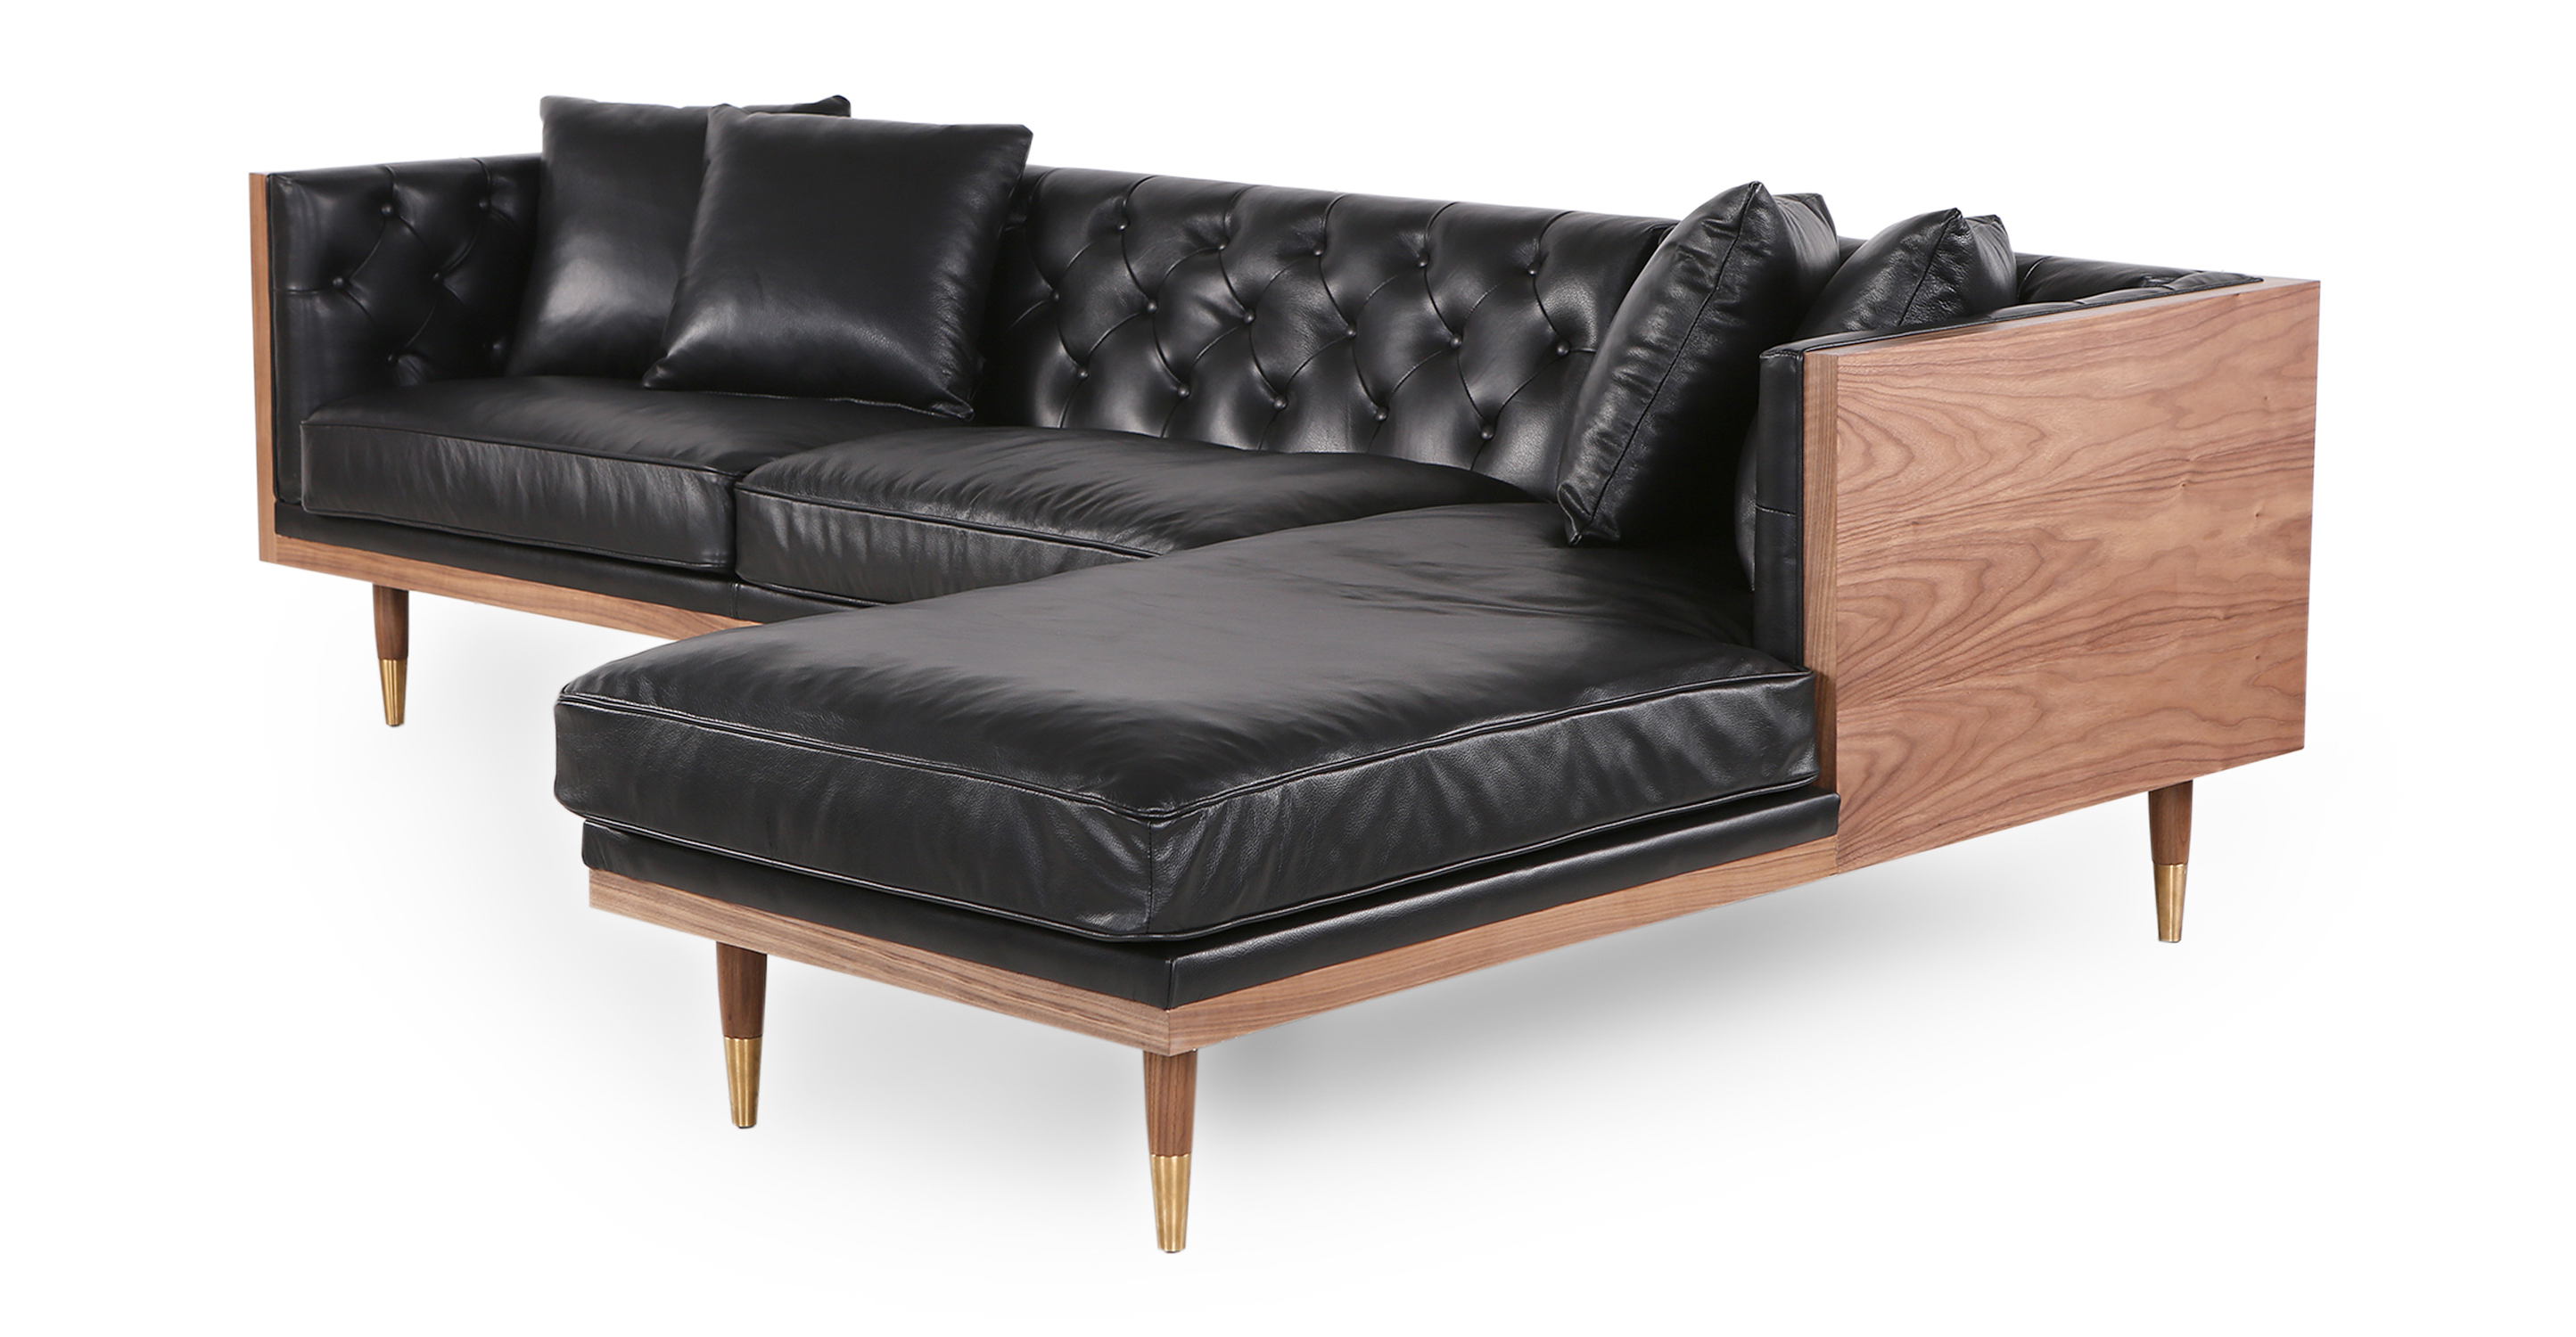 "Woodrow Neo 99"" Leather Sofa Sectional Right, Walnut/Black Aniline"